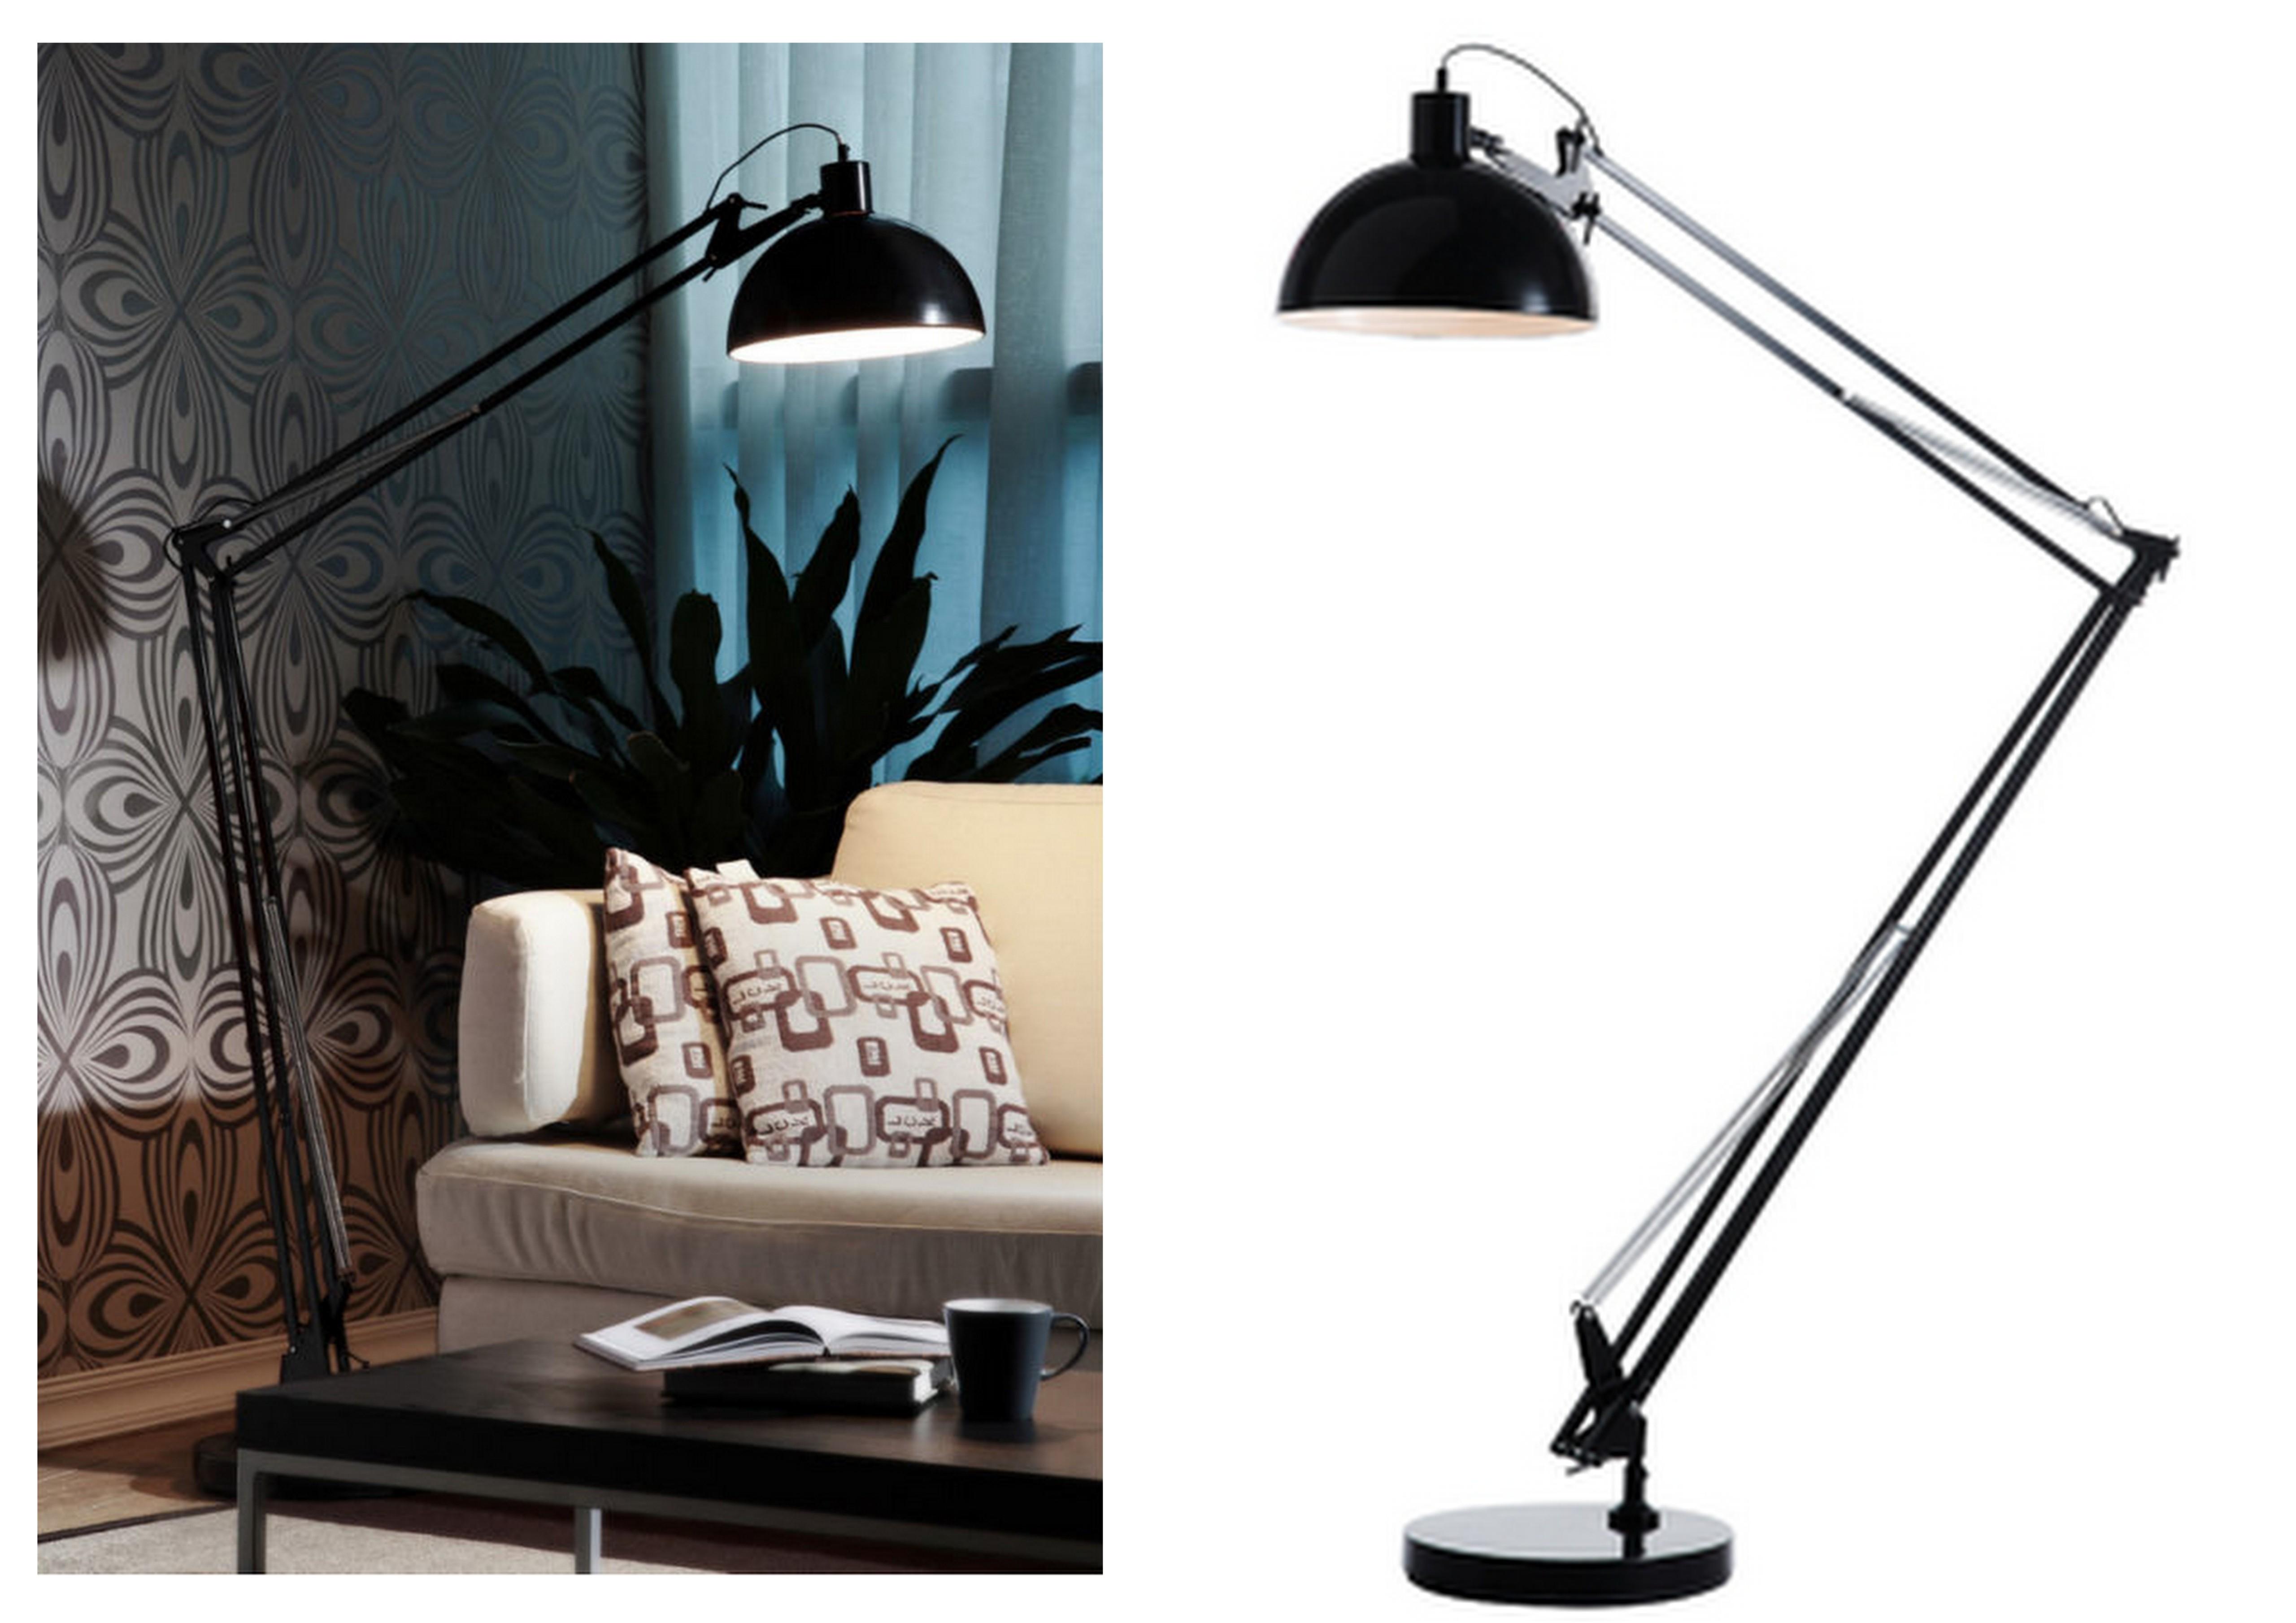 Furniture Fresh Best Office Desk Lamps Halogen In Office regarding sizing 5120 X 3620